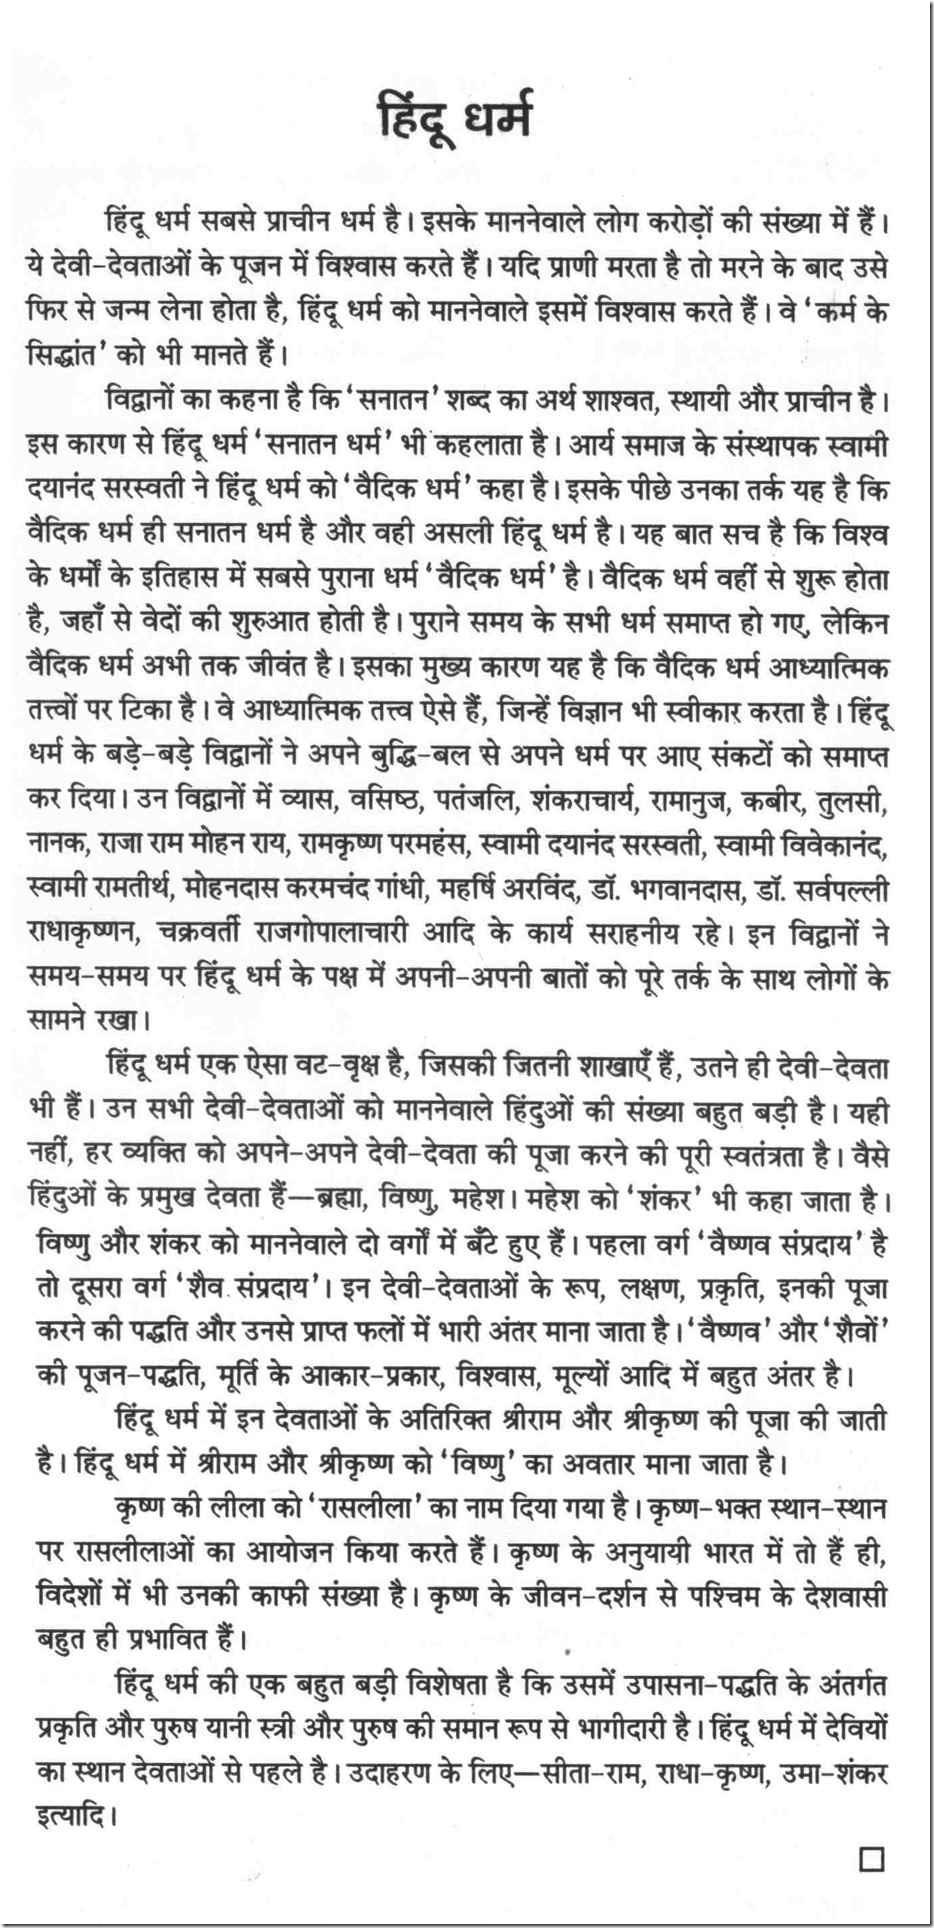 003 Hinduism Essay 10044 Thumb Surprising Questions Hindu Muslim Ekta In Hindi And Buddhism Introduction Full